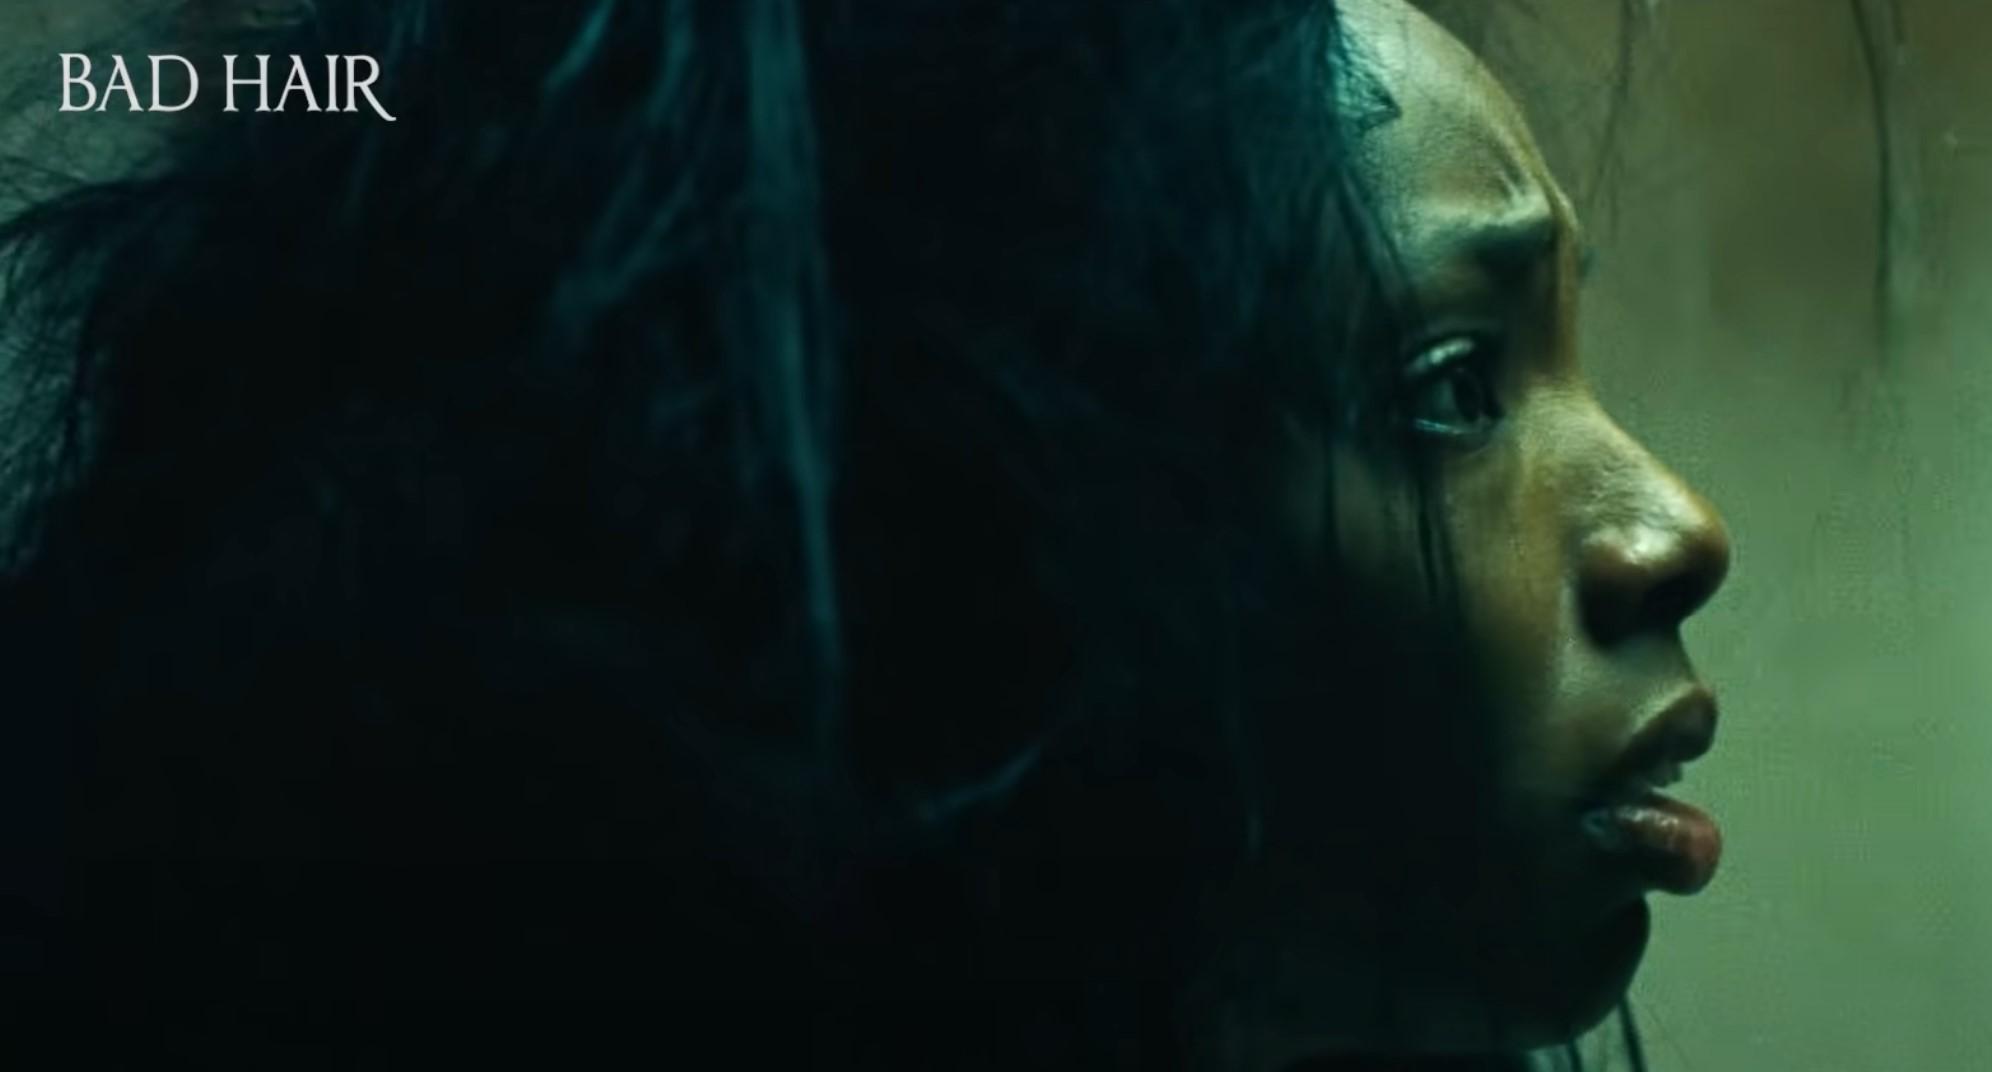 Bad Hair 2020 Horror/Thriller Watch Online Prime & Hulu